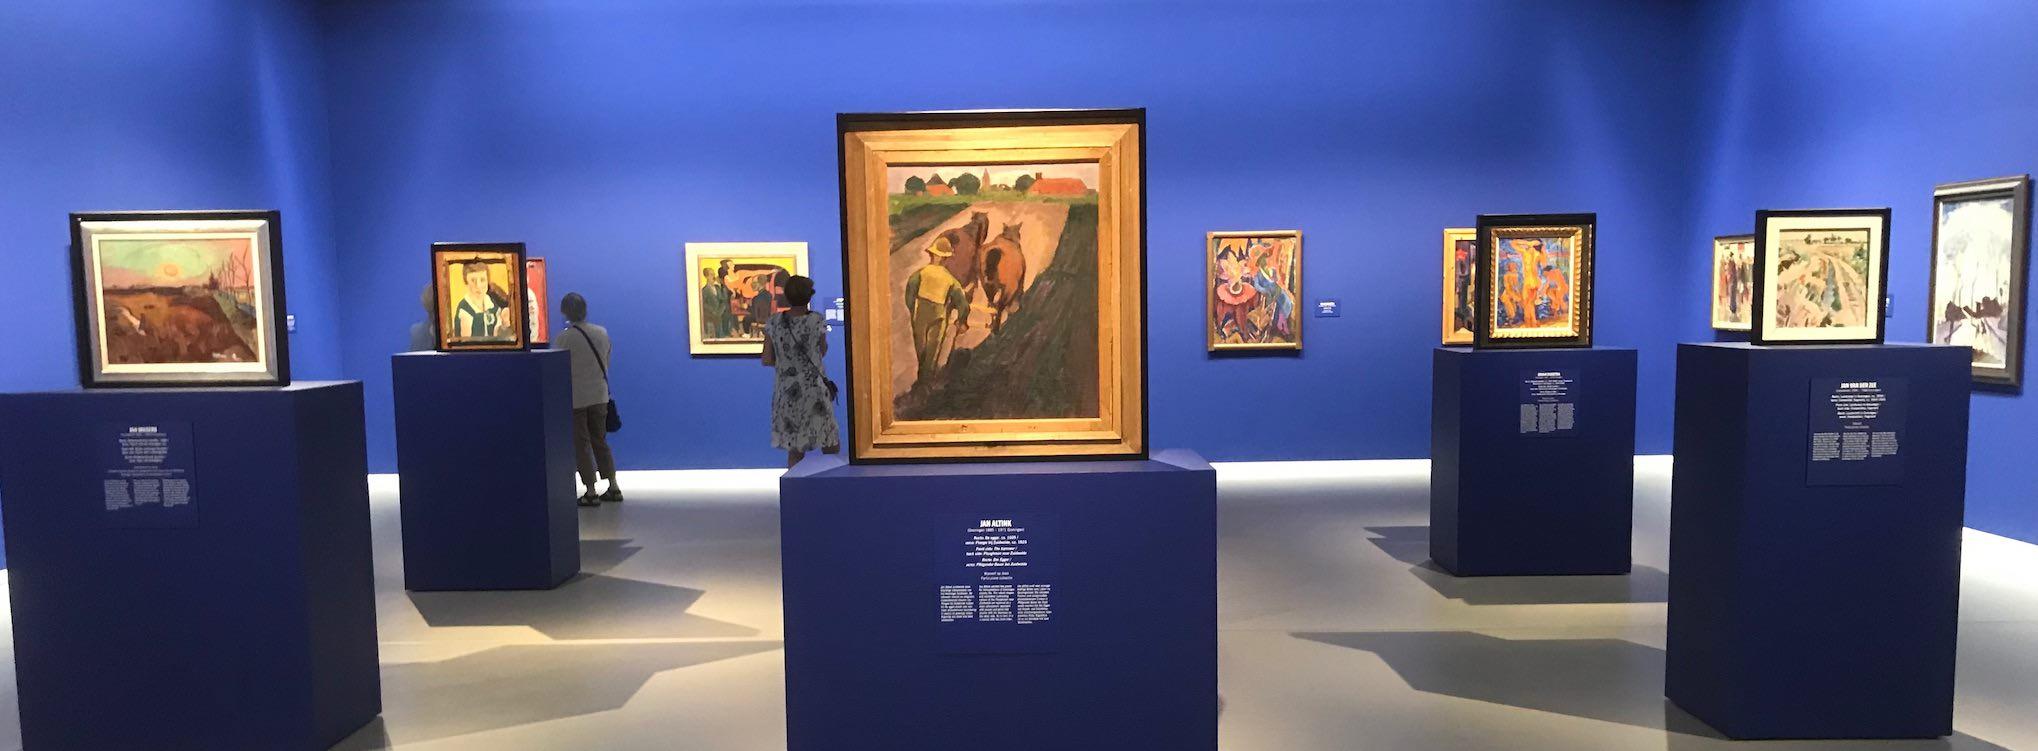 Groningen - Museum - Ausstellung De Ploeg